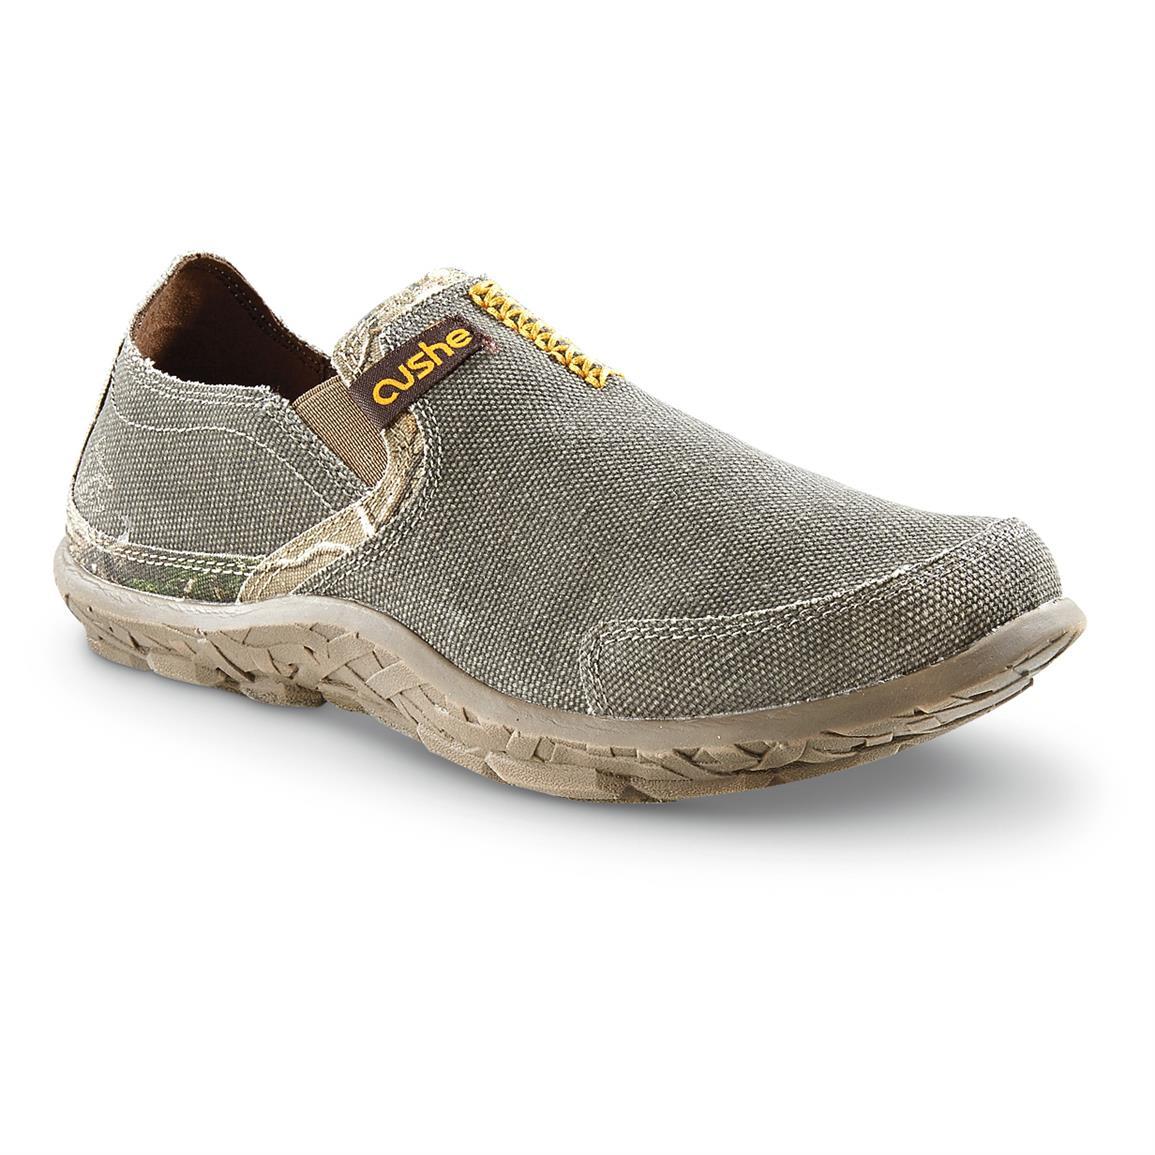 cushe shoes cushe menu0027s camo trim casual slip-on shoes TCERHJQ